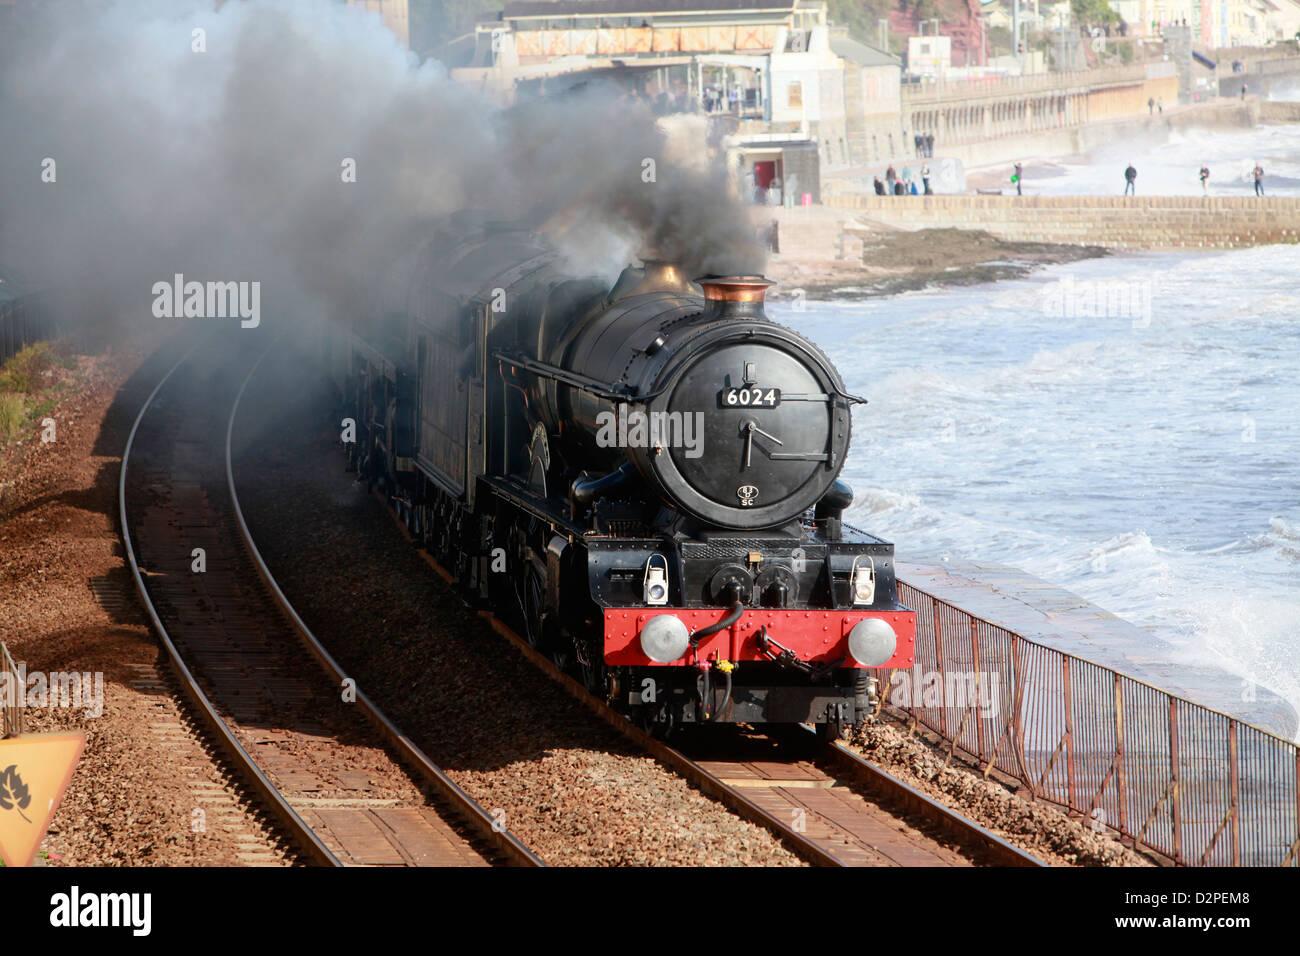 A vintage steam locomotive passes through Dawlish on the famous Brunel railway line - Stock Image